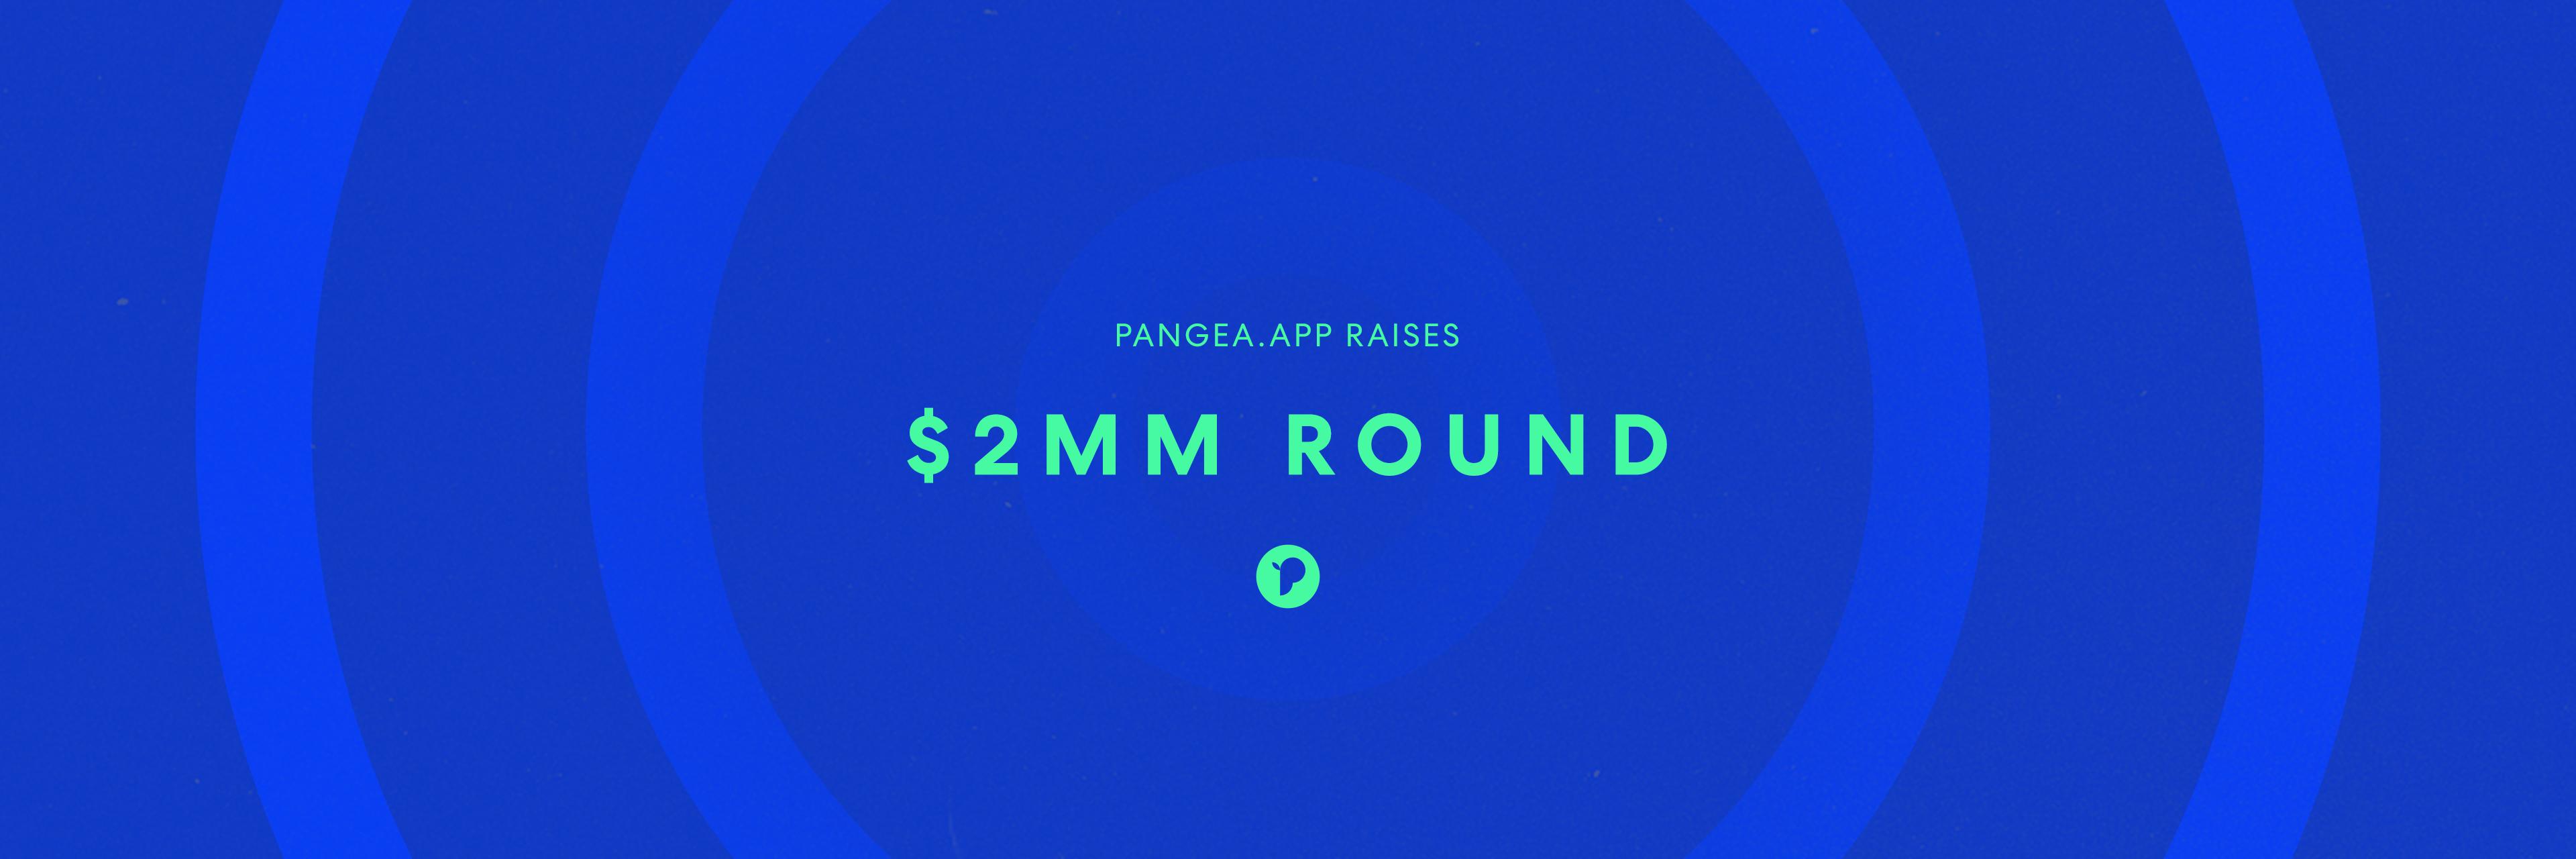 Pangea.app Raises $2MM Seed Round